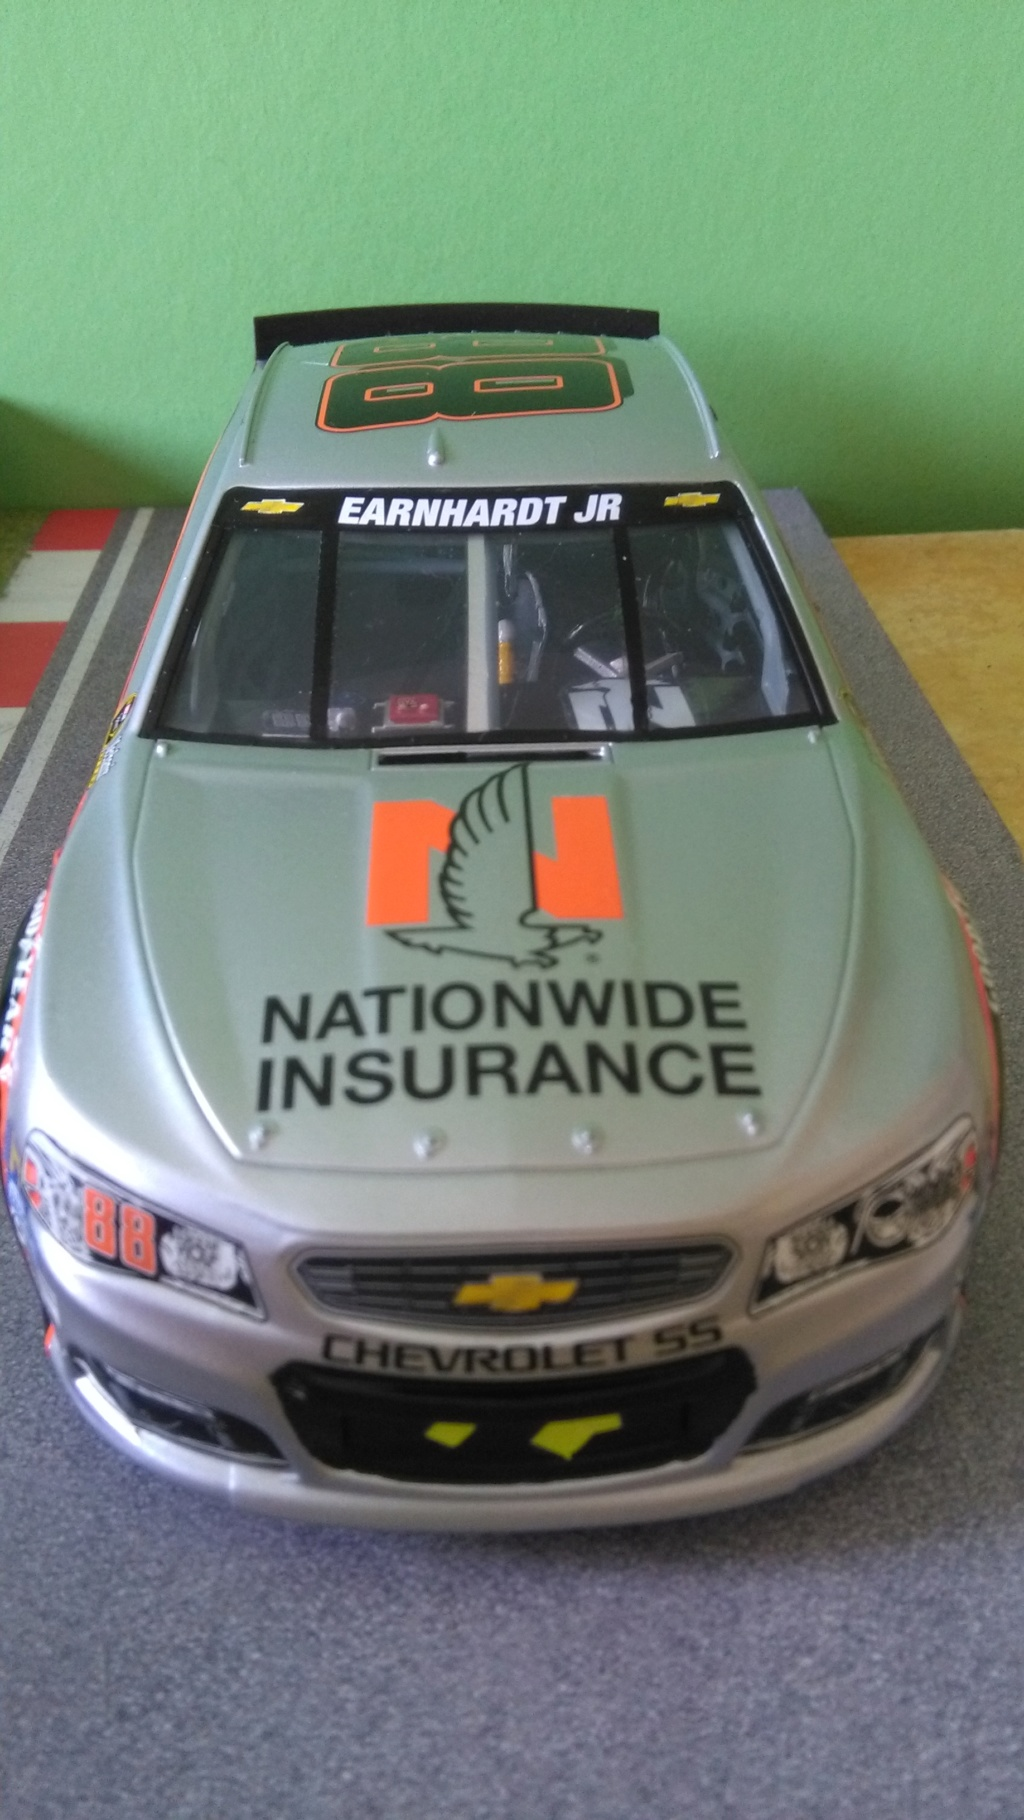 Chevy SS 2016 #88 Jeff gordon nationwide insurance Img_2043